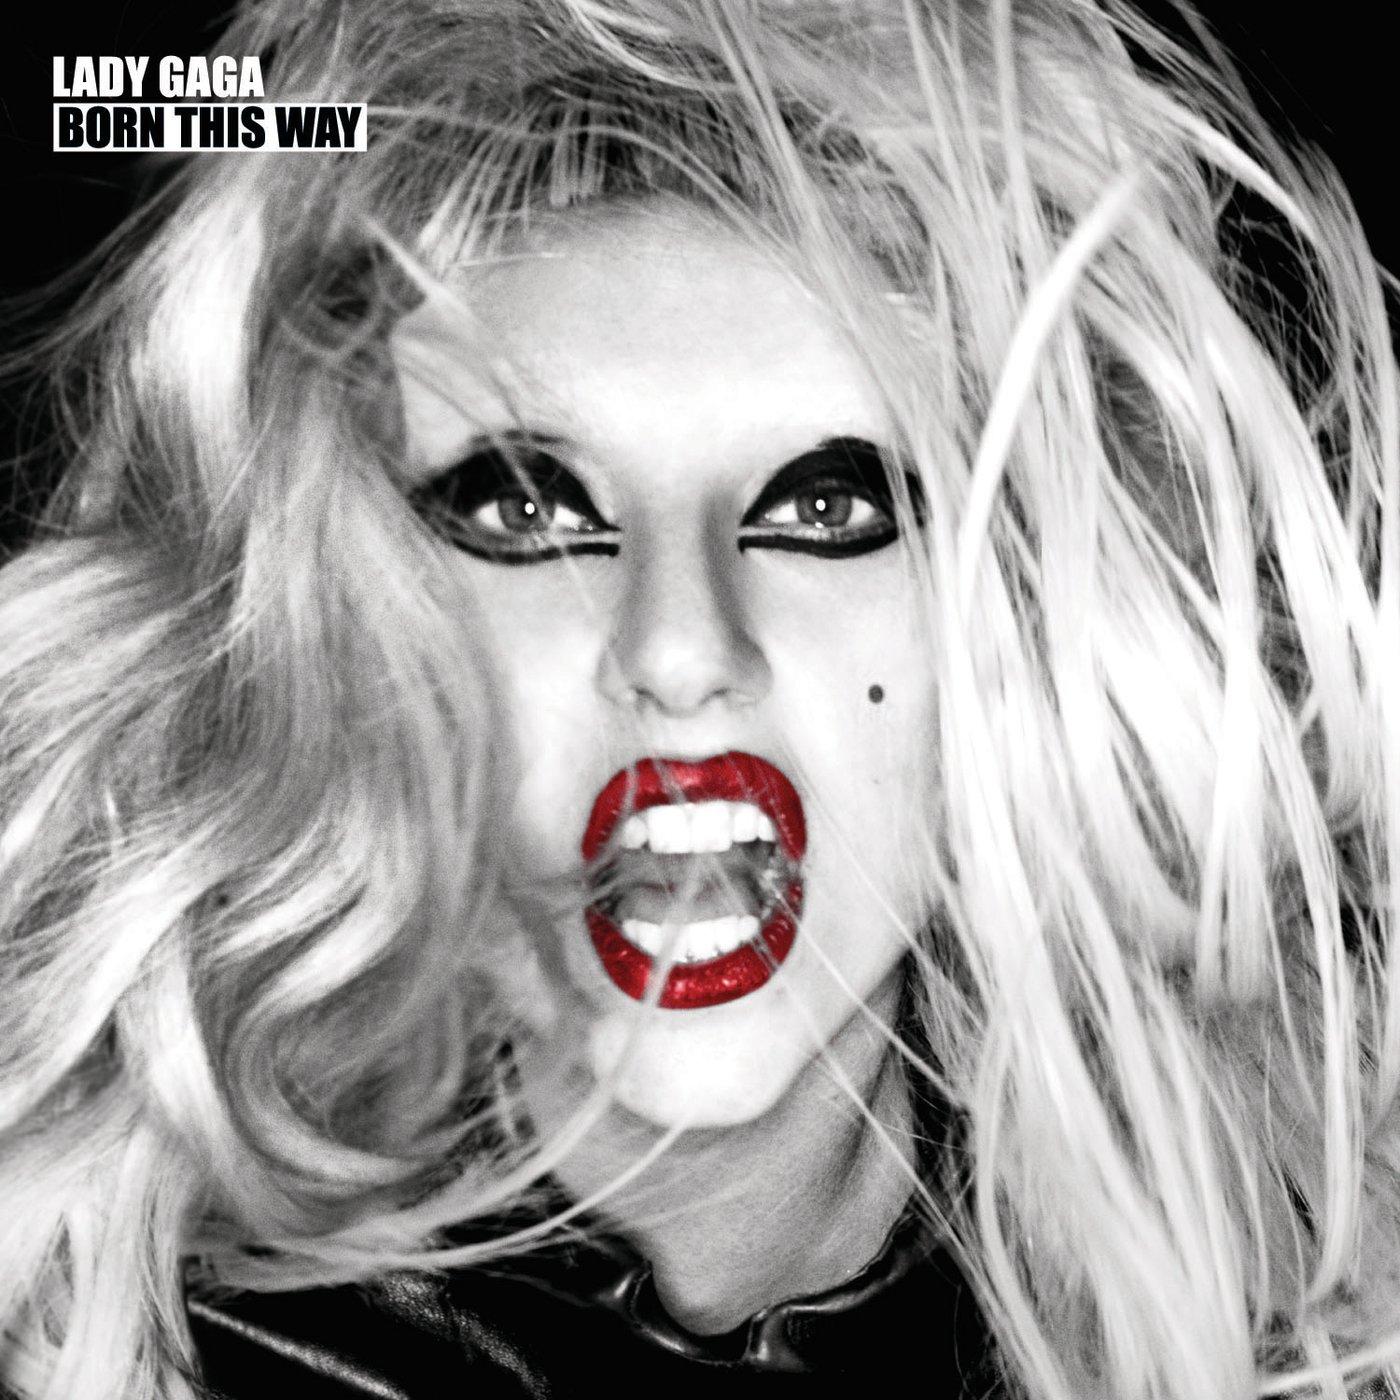 Risultati immagini per born this way album cover